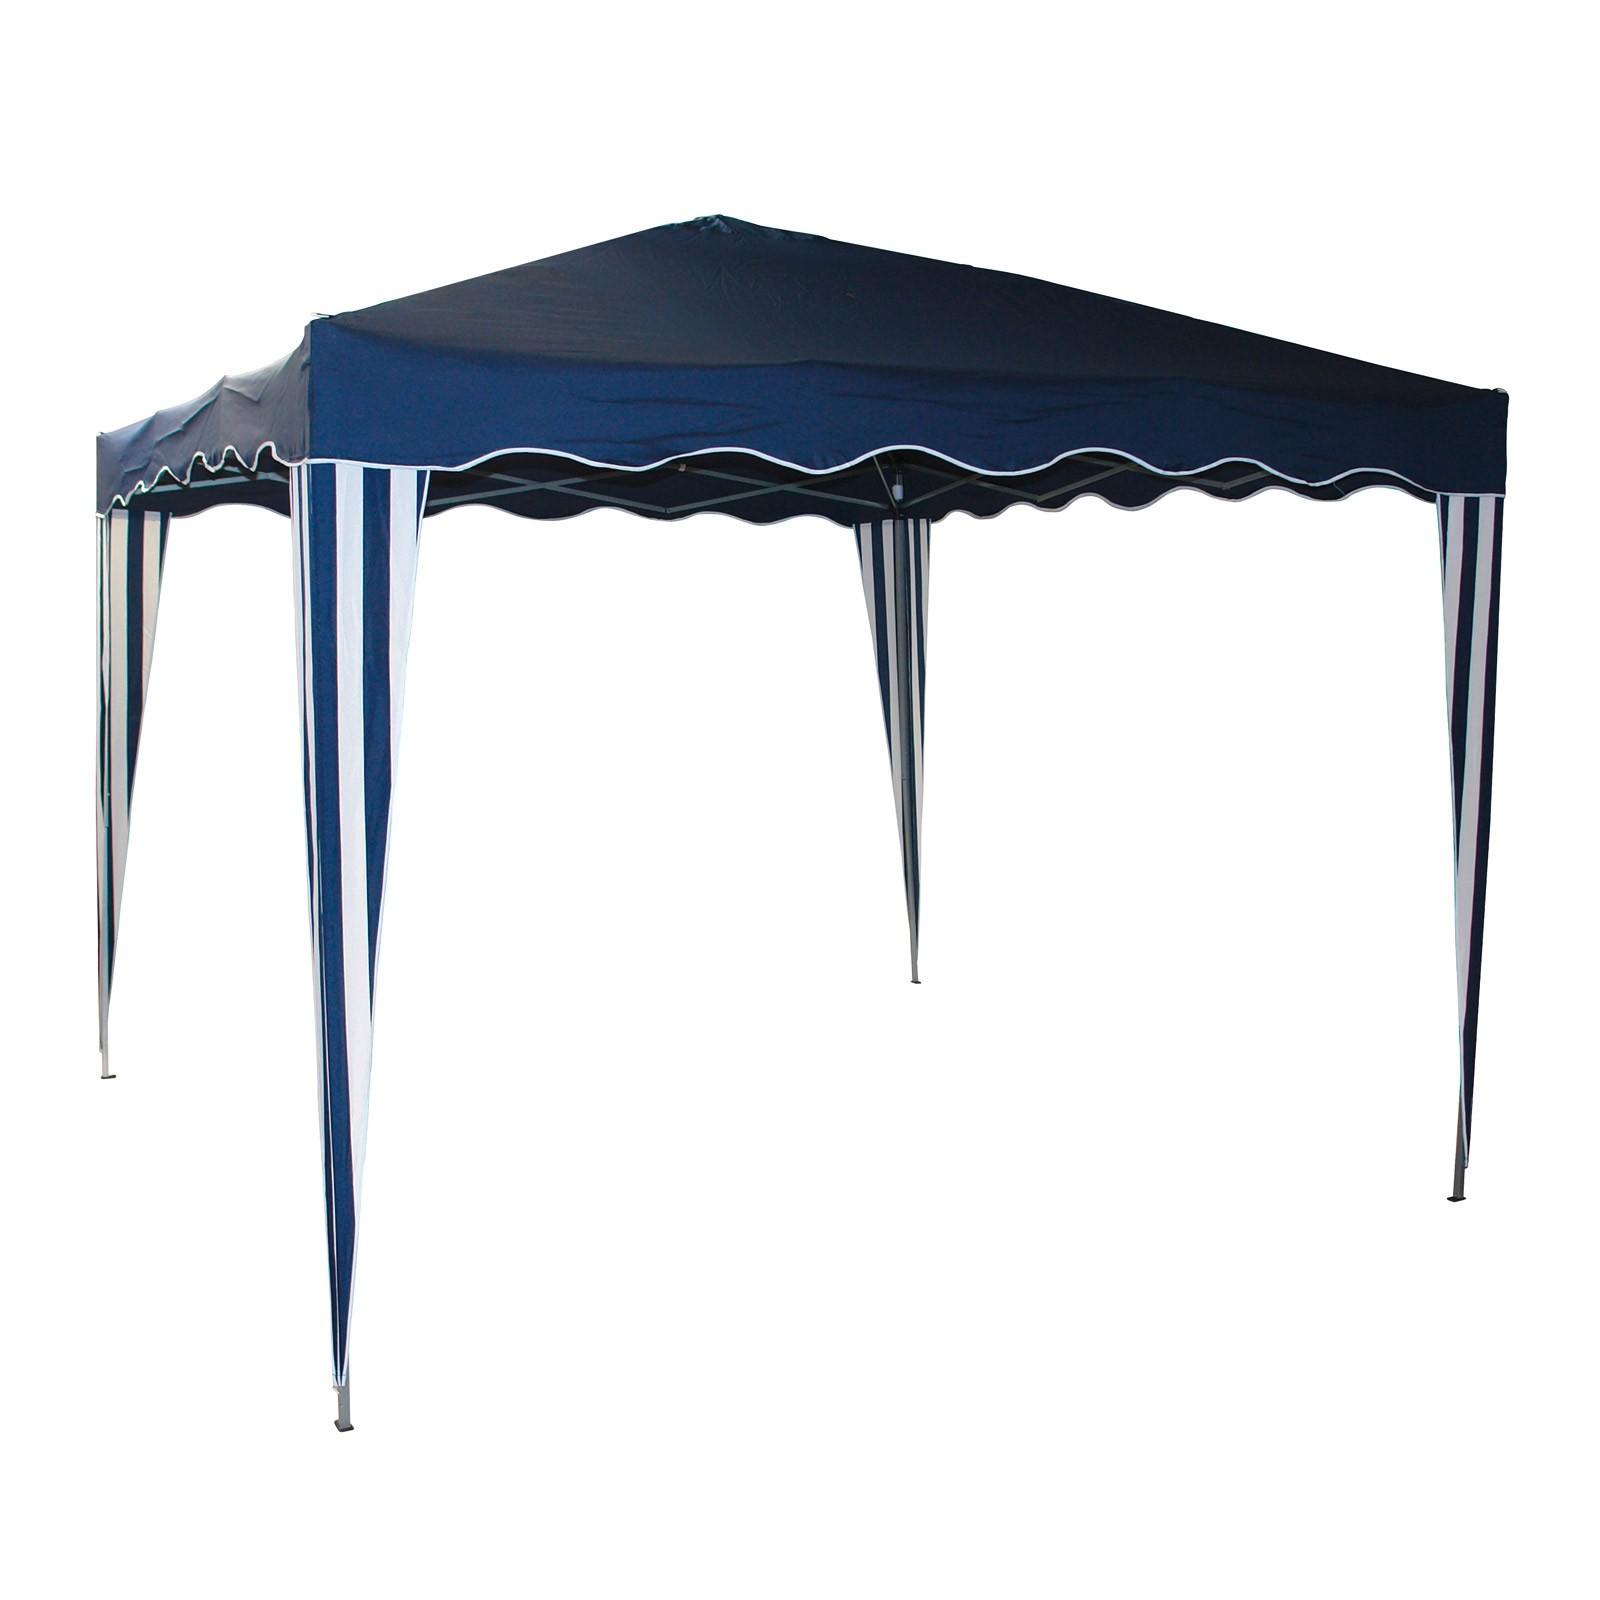 gartenpavillon faltpavillon alu metall 3x3 meter blau gartenzelt partyzelt ebay. Black Bedroom Furniture Sets. Home Design Ideas